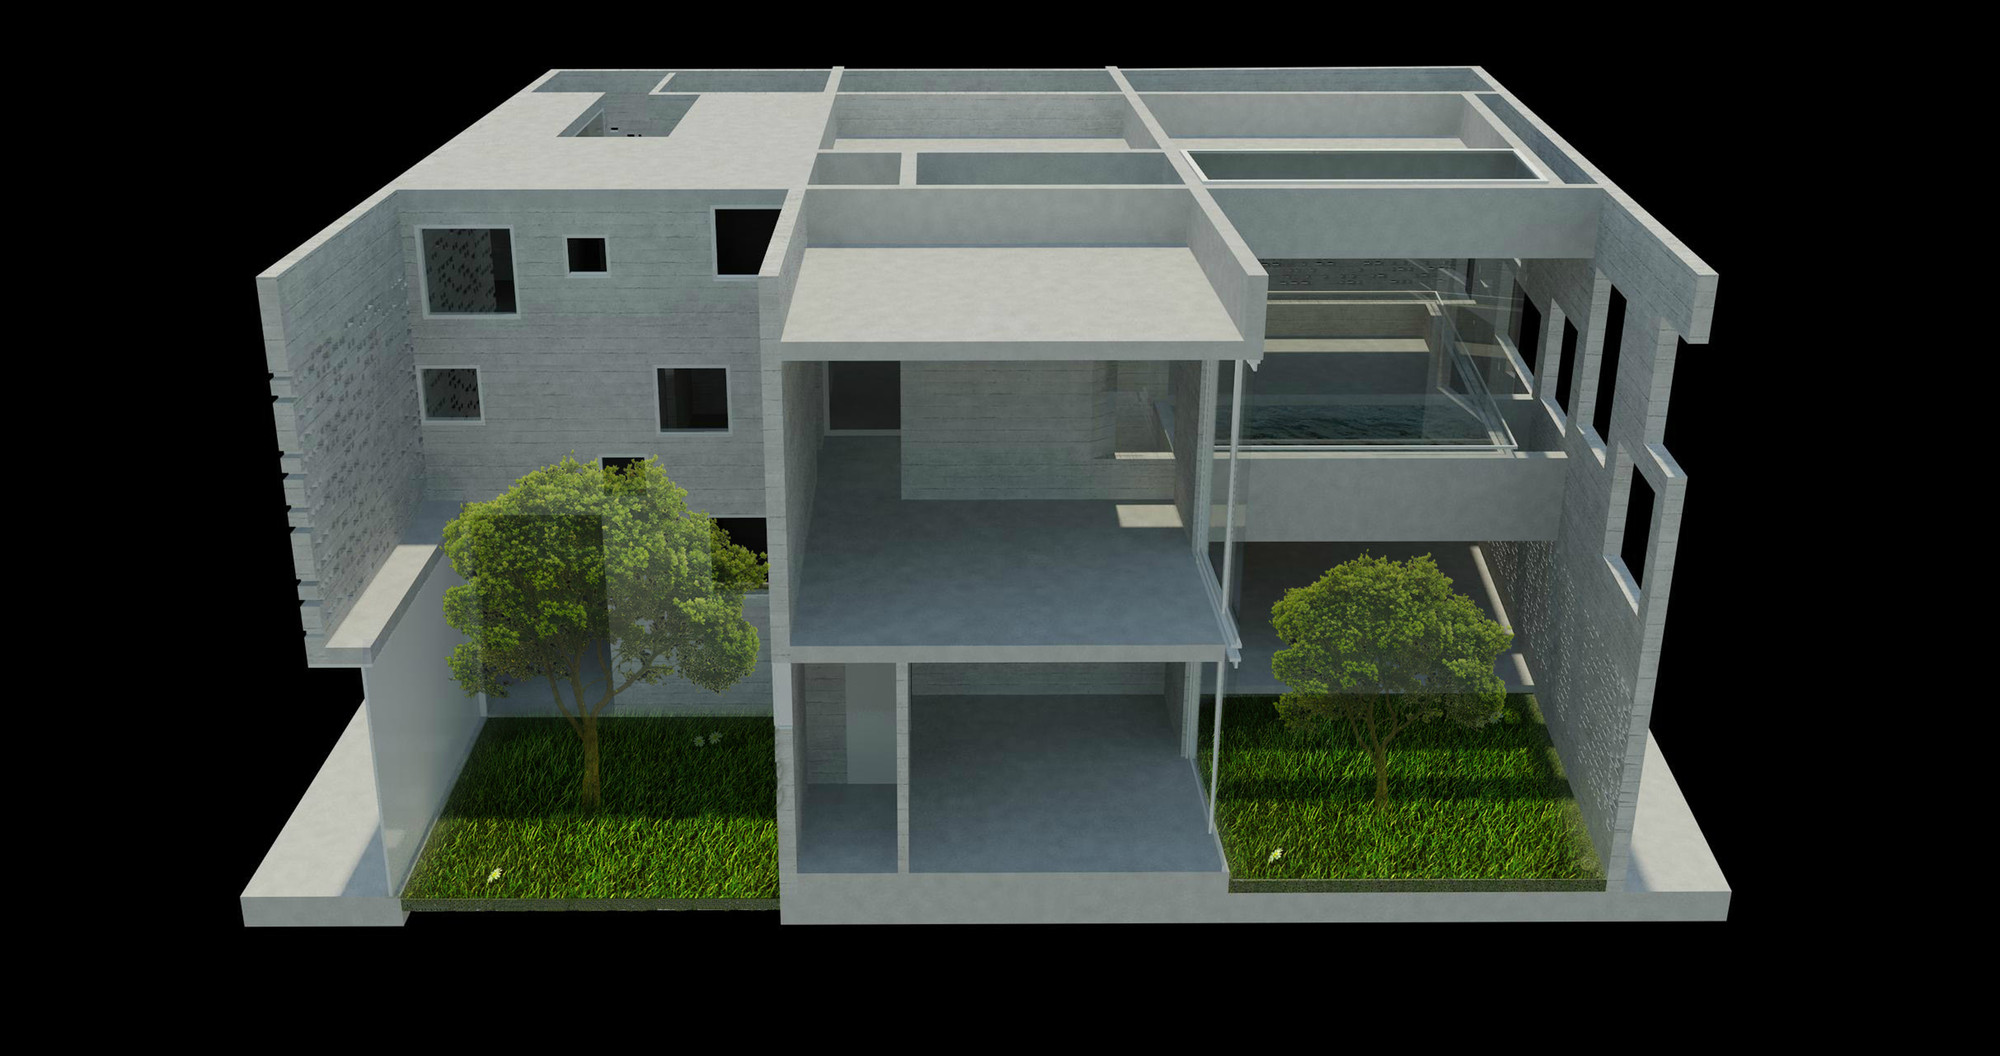 Imagen Exterior 03. Image Courtesy of Seinfeld Arquitectos